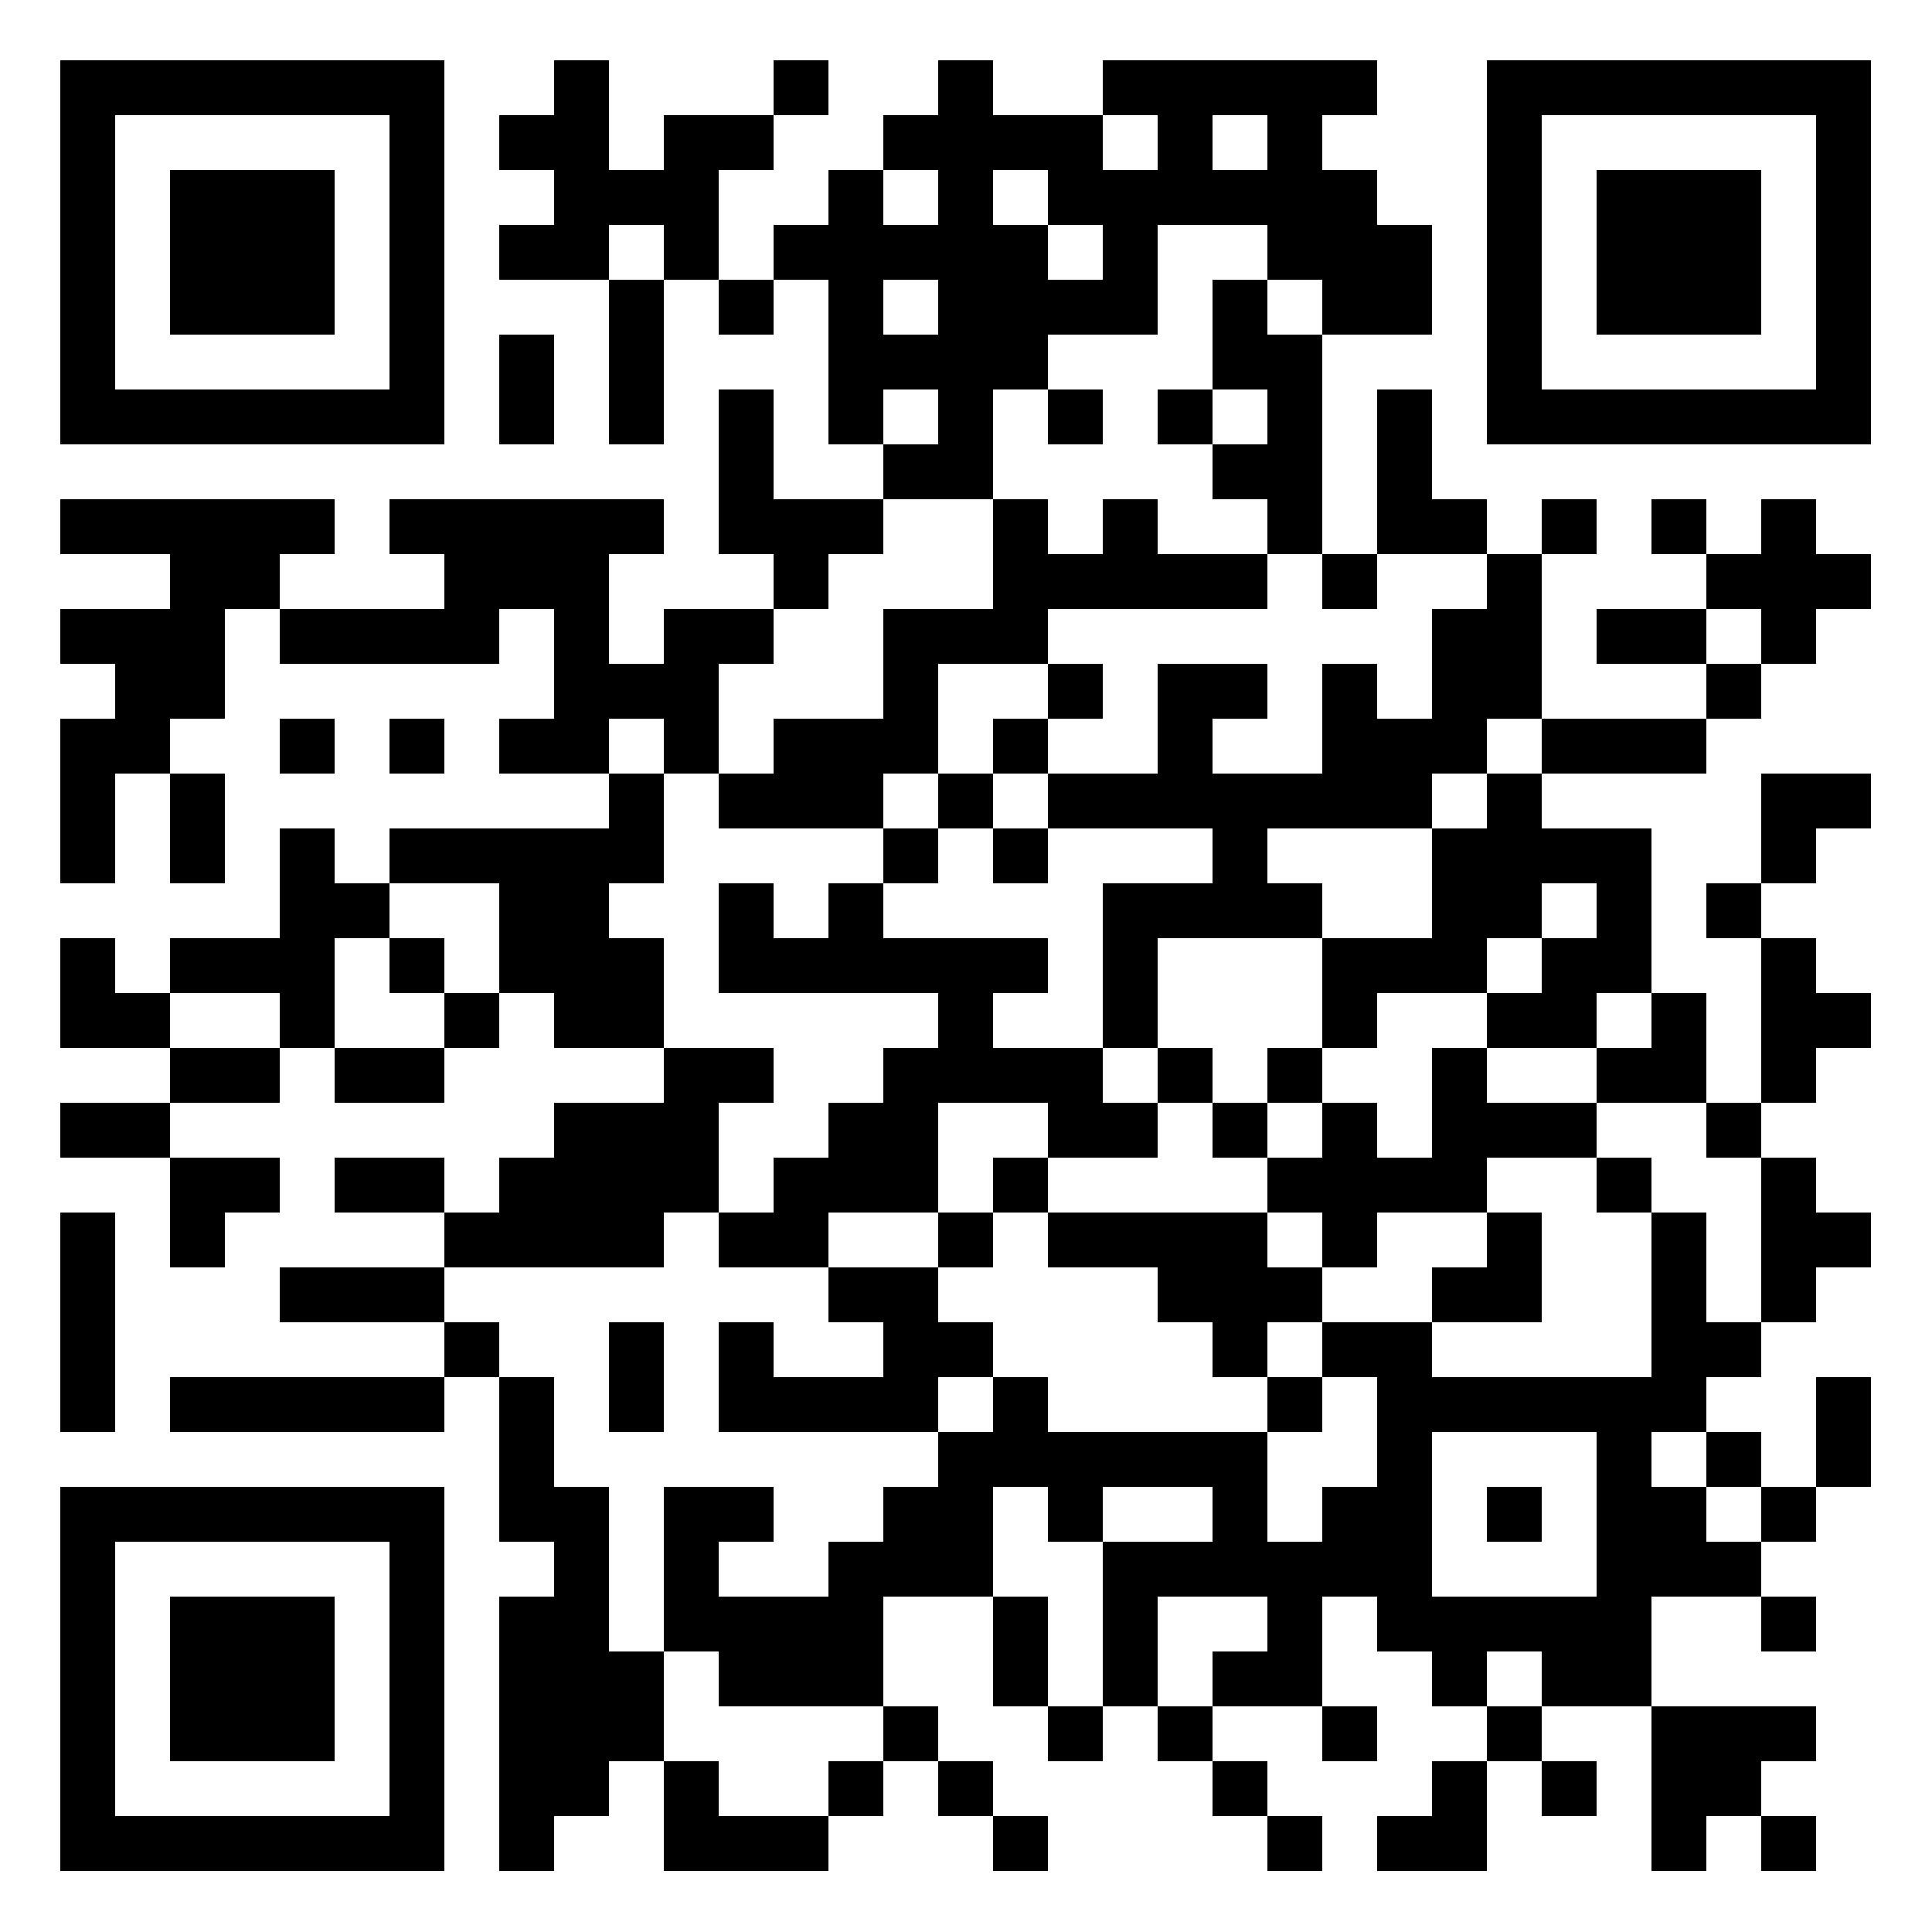 https://sites.google.com/a/web1.dara.ac.th/rongreiyn-dara-withyalay/